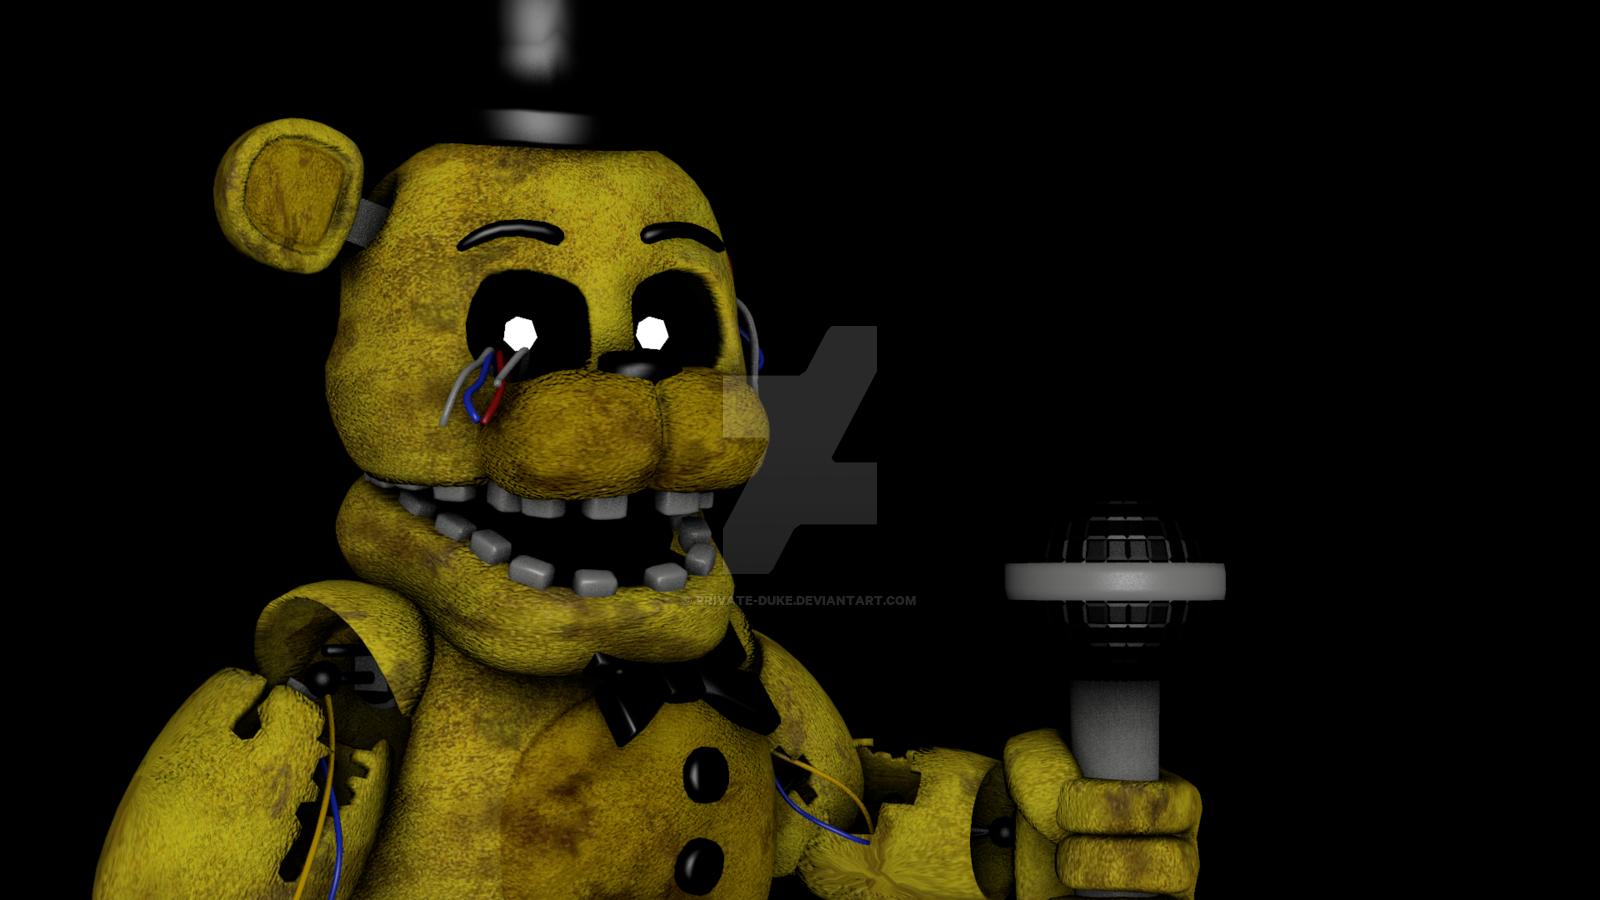 [SFM] Golden Freddy by Private Duke 1600x900